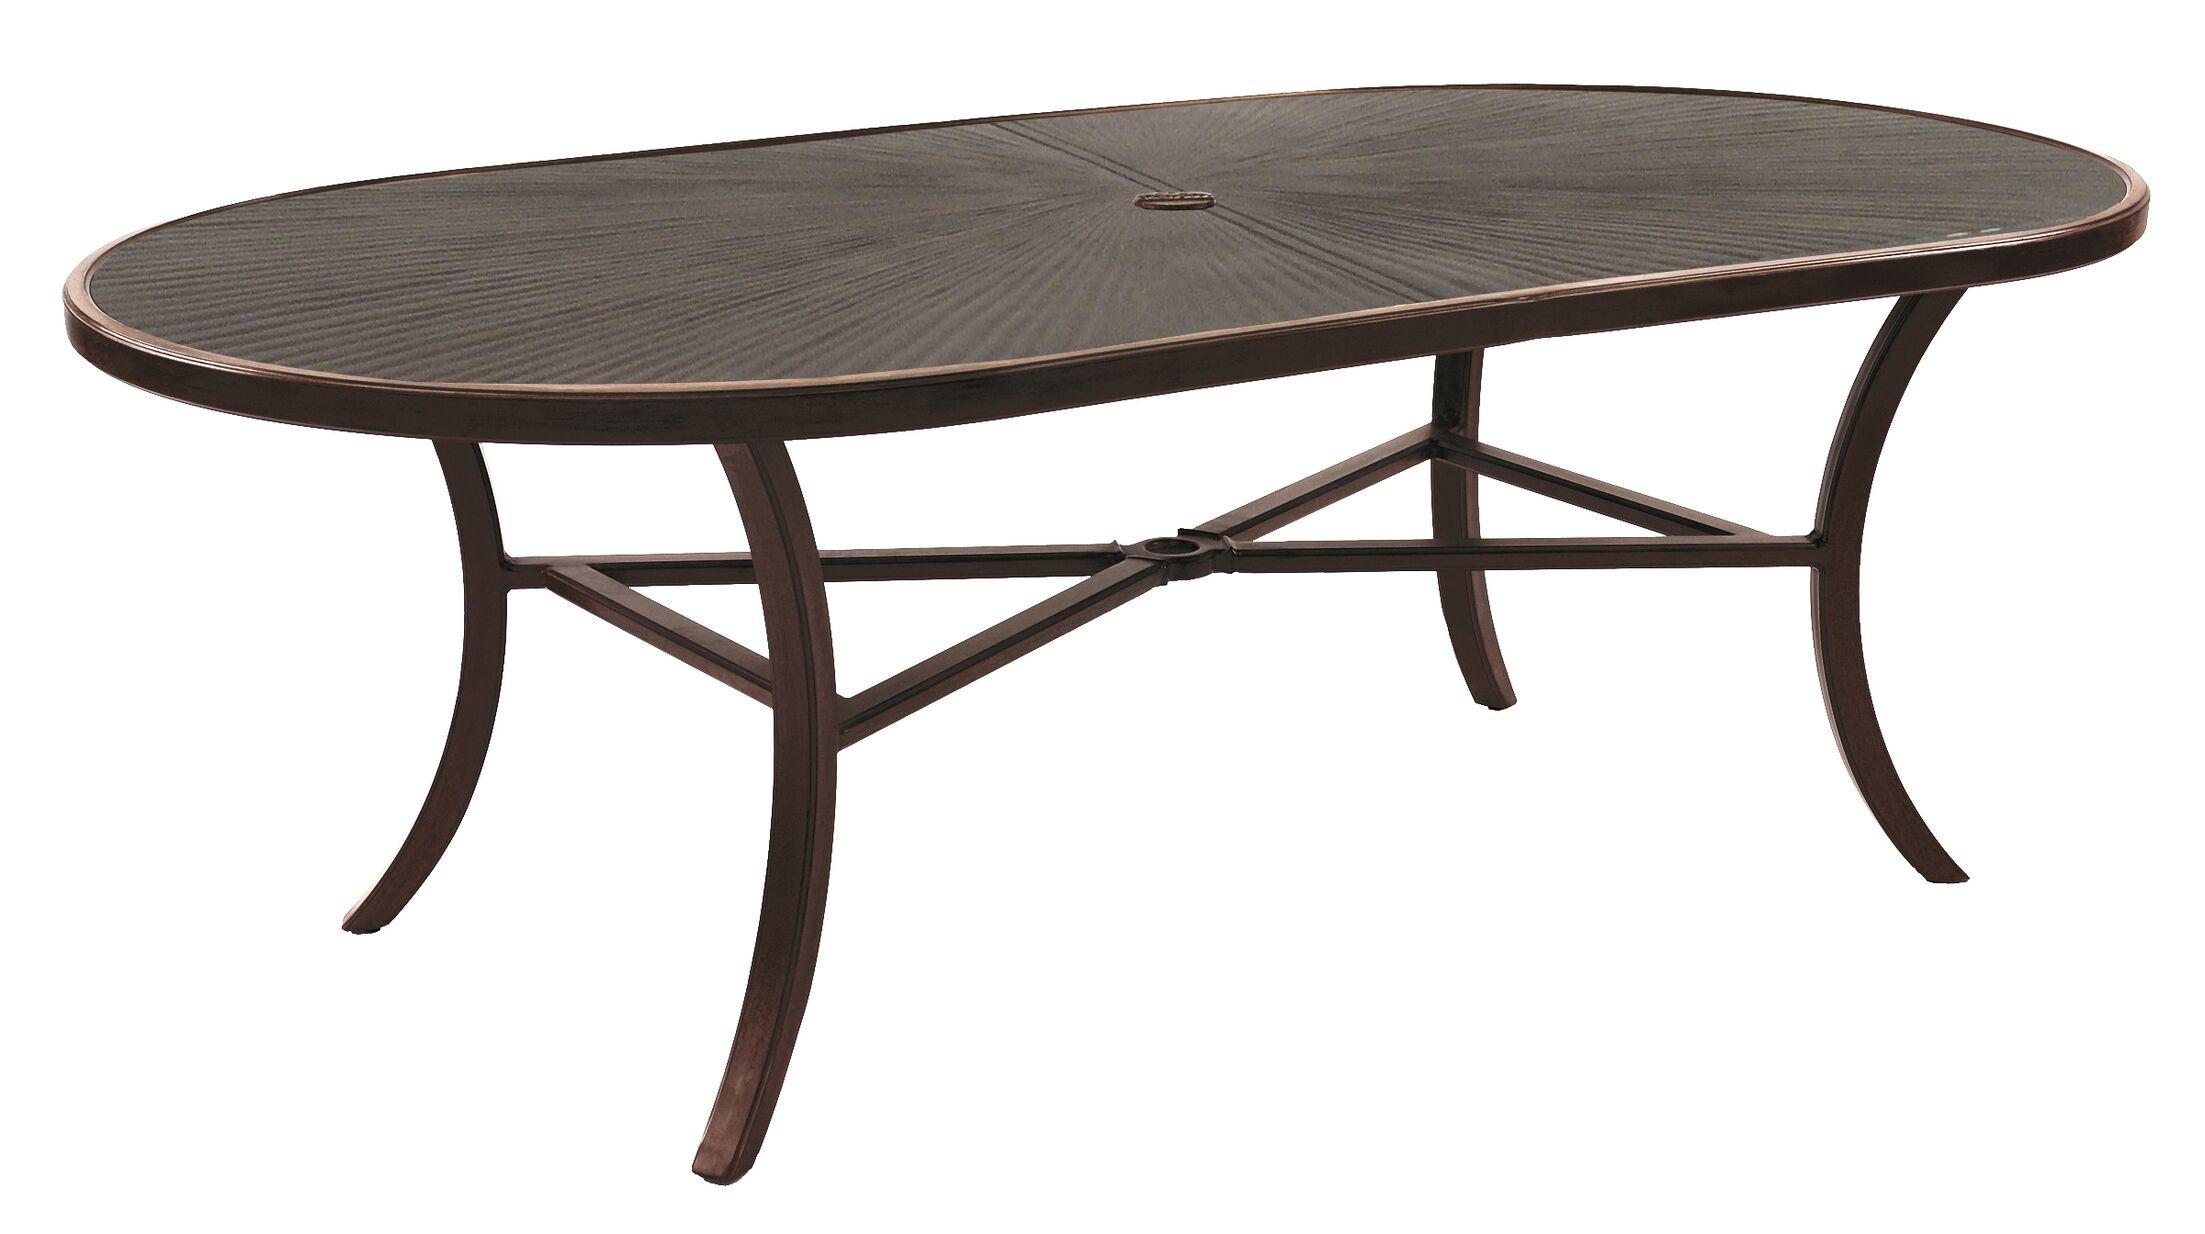 Heritage Aluminum Dining Table